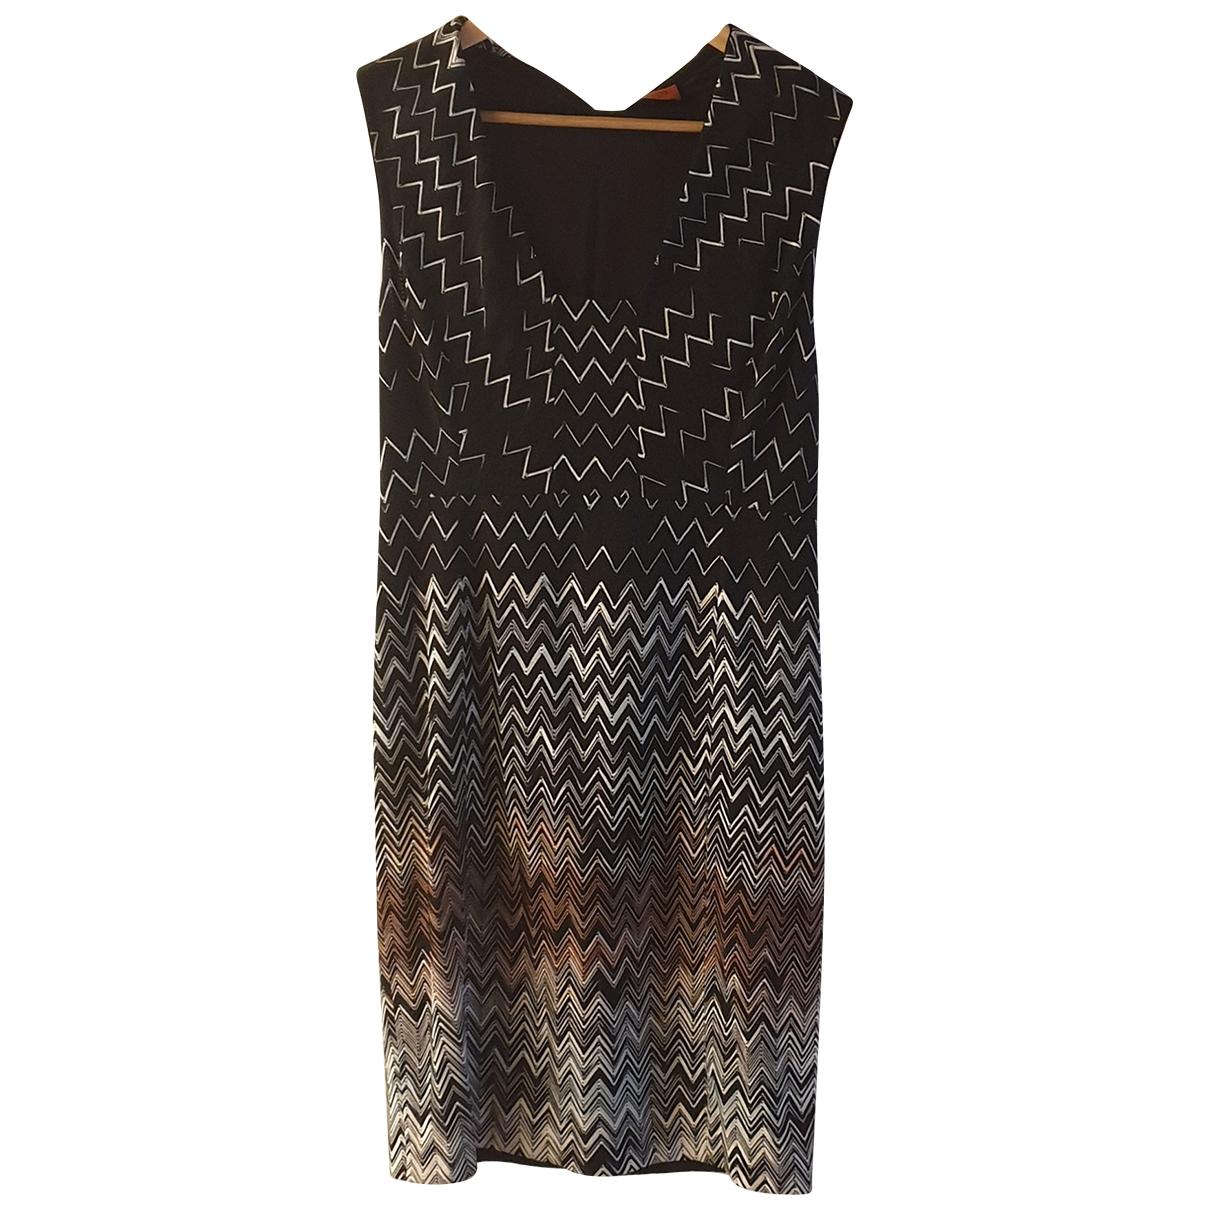 Missoni \N Multicolour Cotton - elasthane dress for Women 44 IT